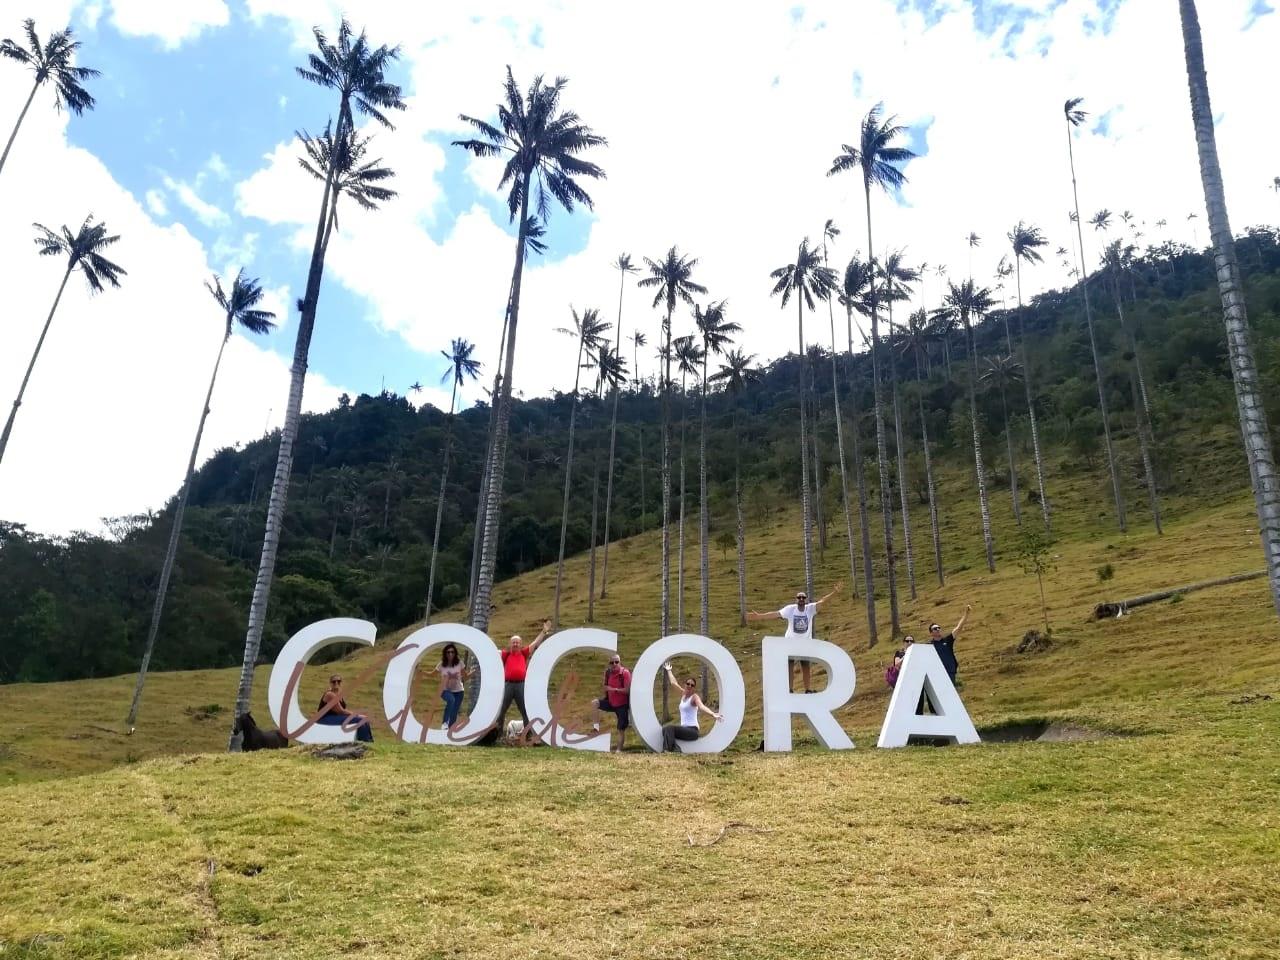 Visiter La vallée de Cocora - Colombie